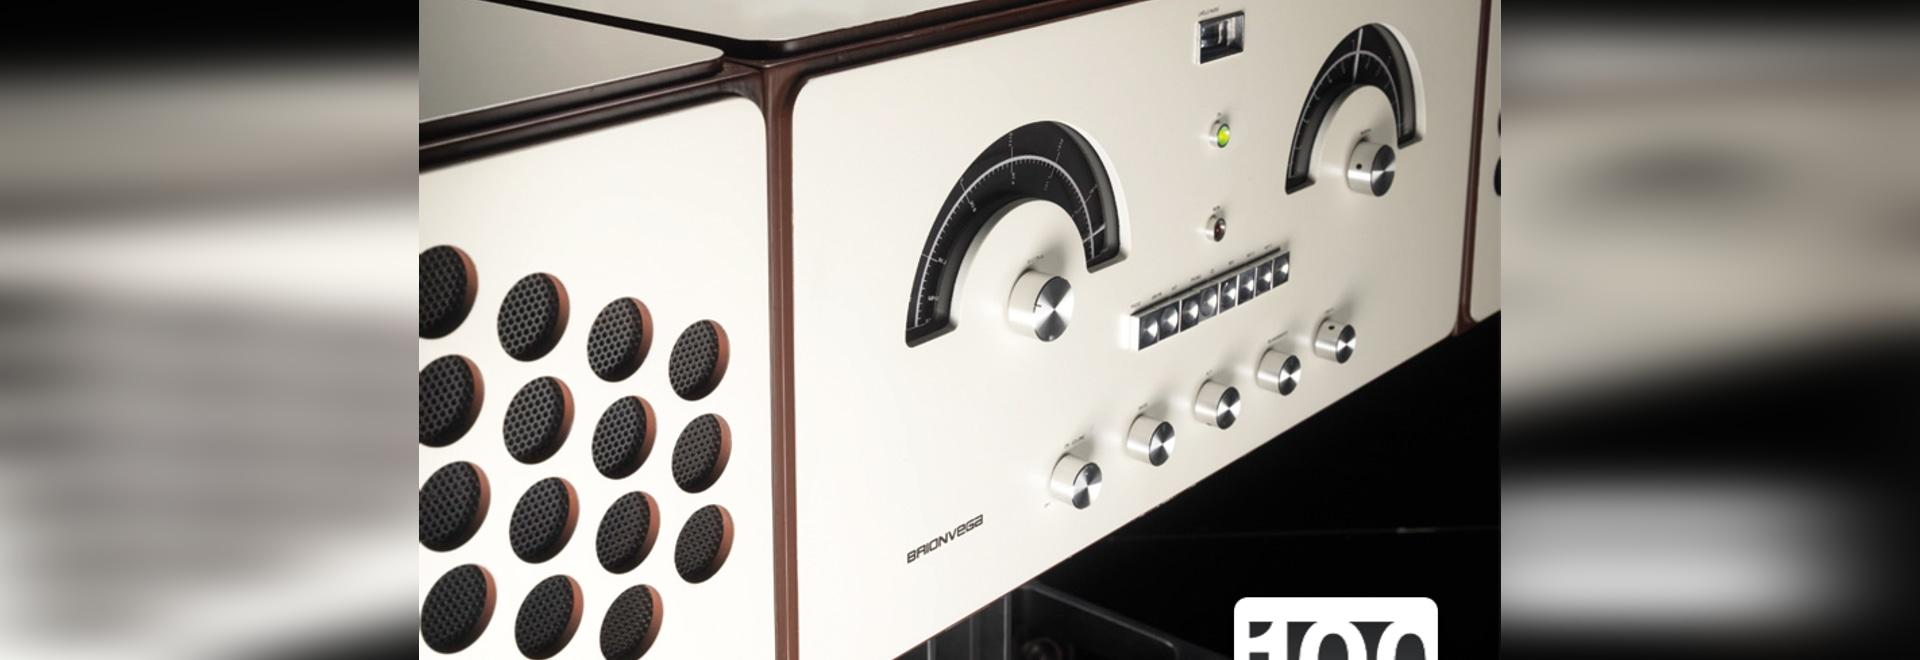 radiofonografo limited edition